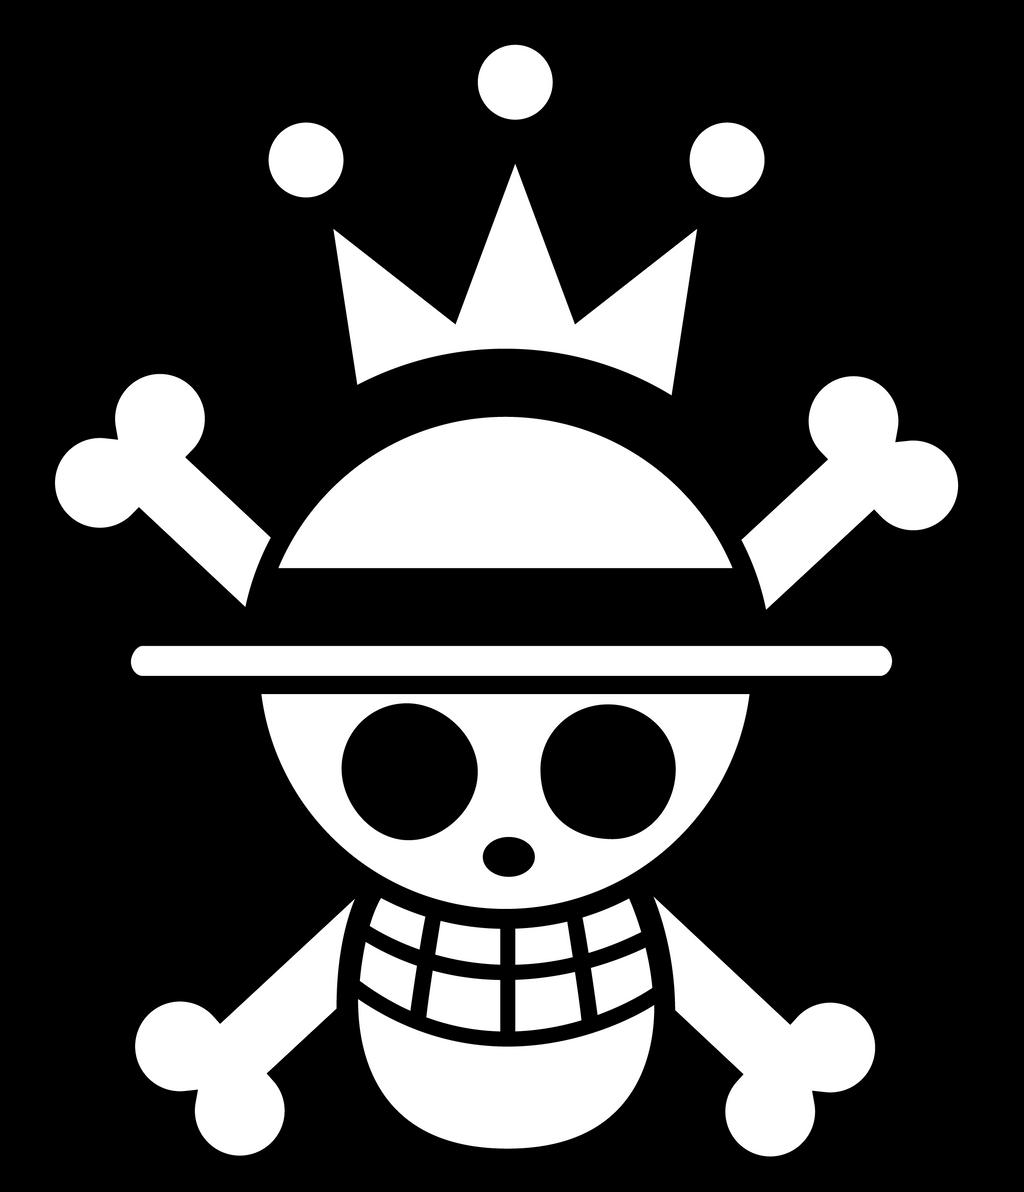 King Luffy Symbol by zerocustom1989 on DeviantArt